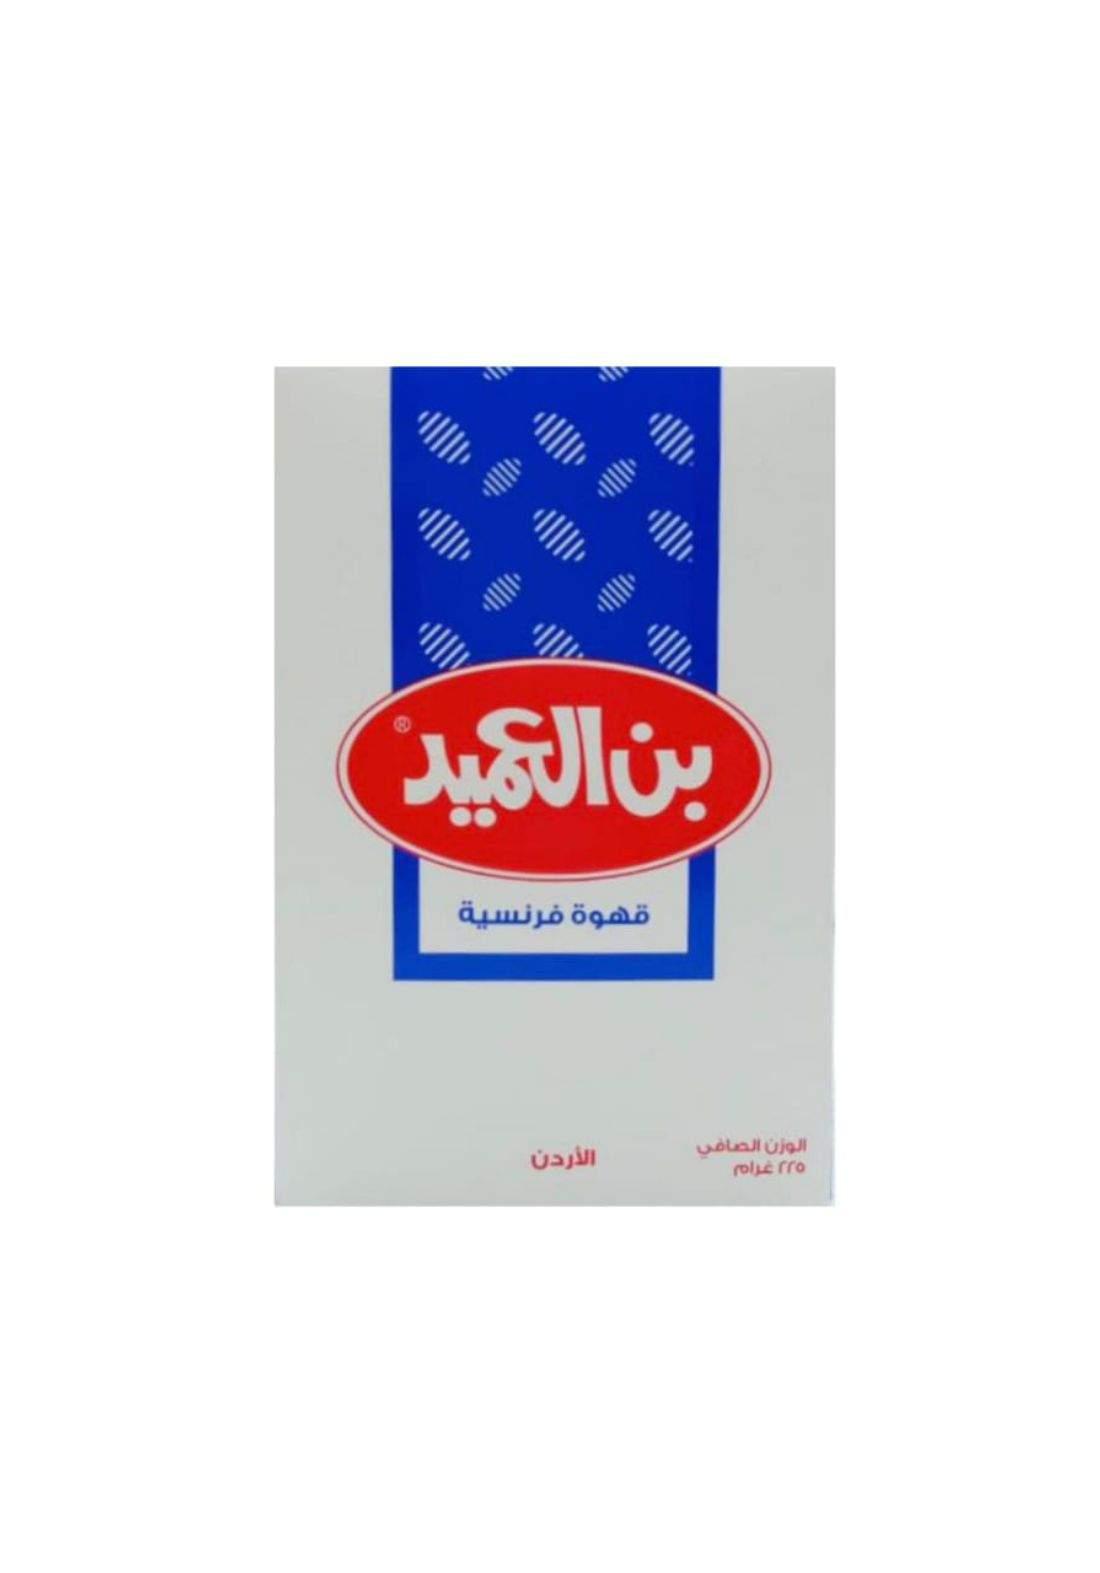 Al-Ameed Coffee French Coffee بن العميد قهوة فرنسية